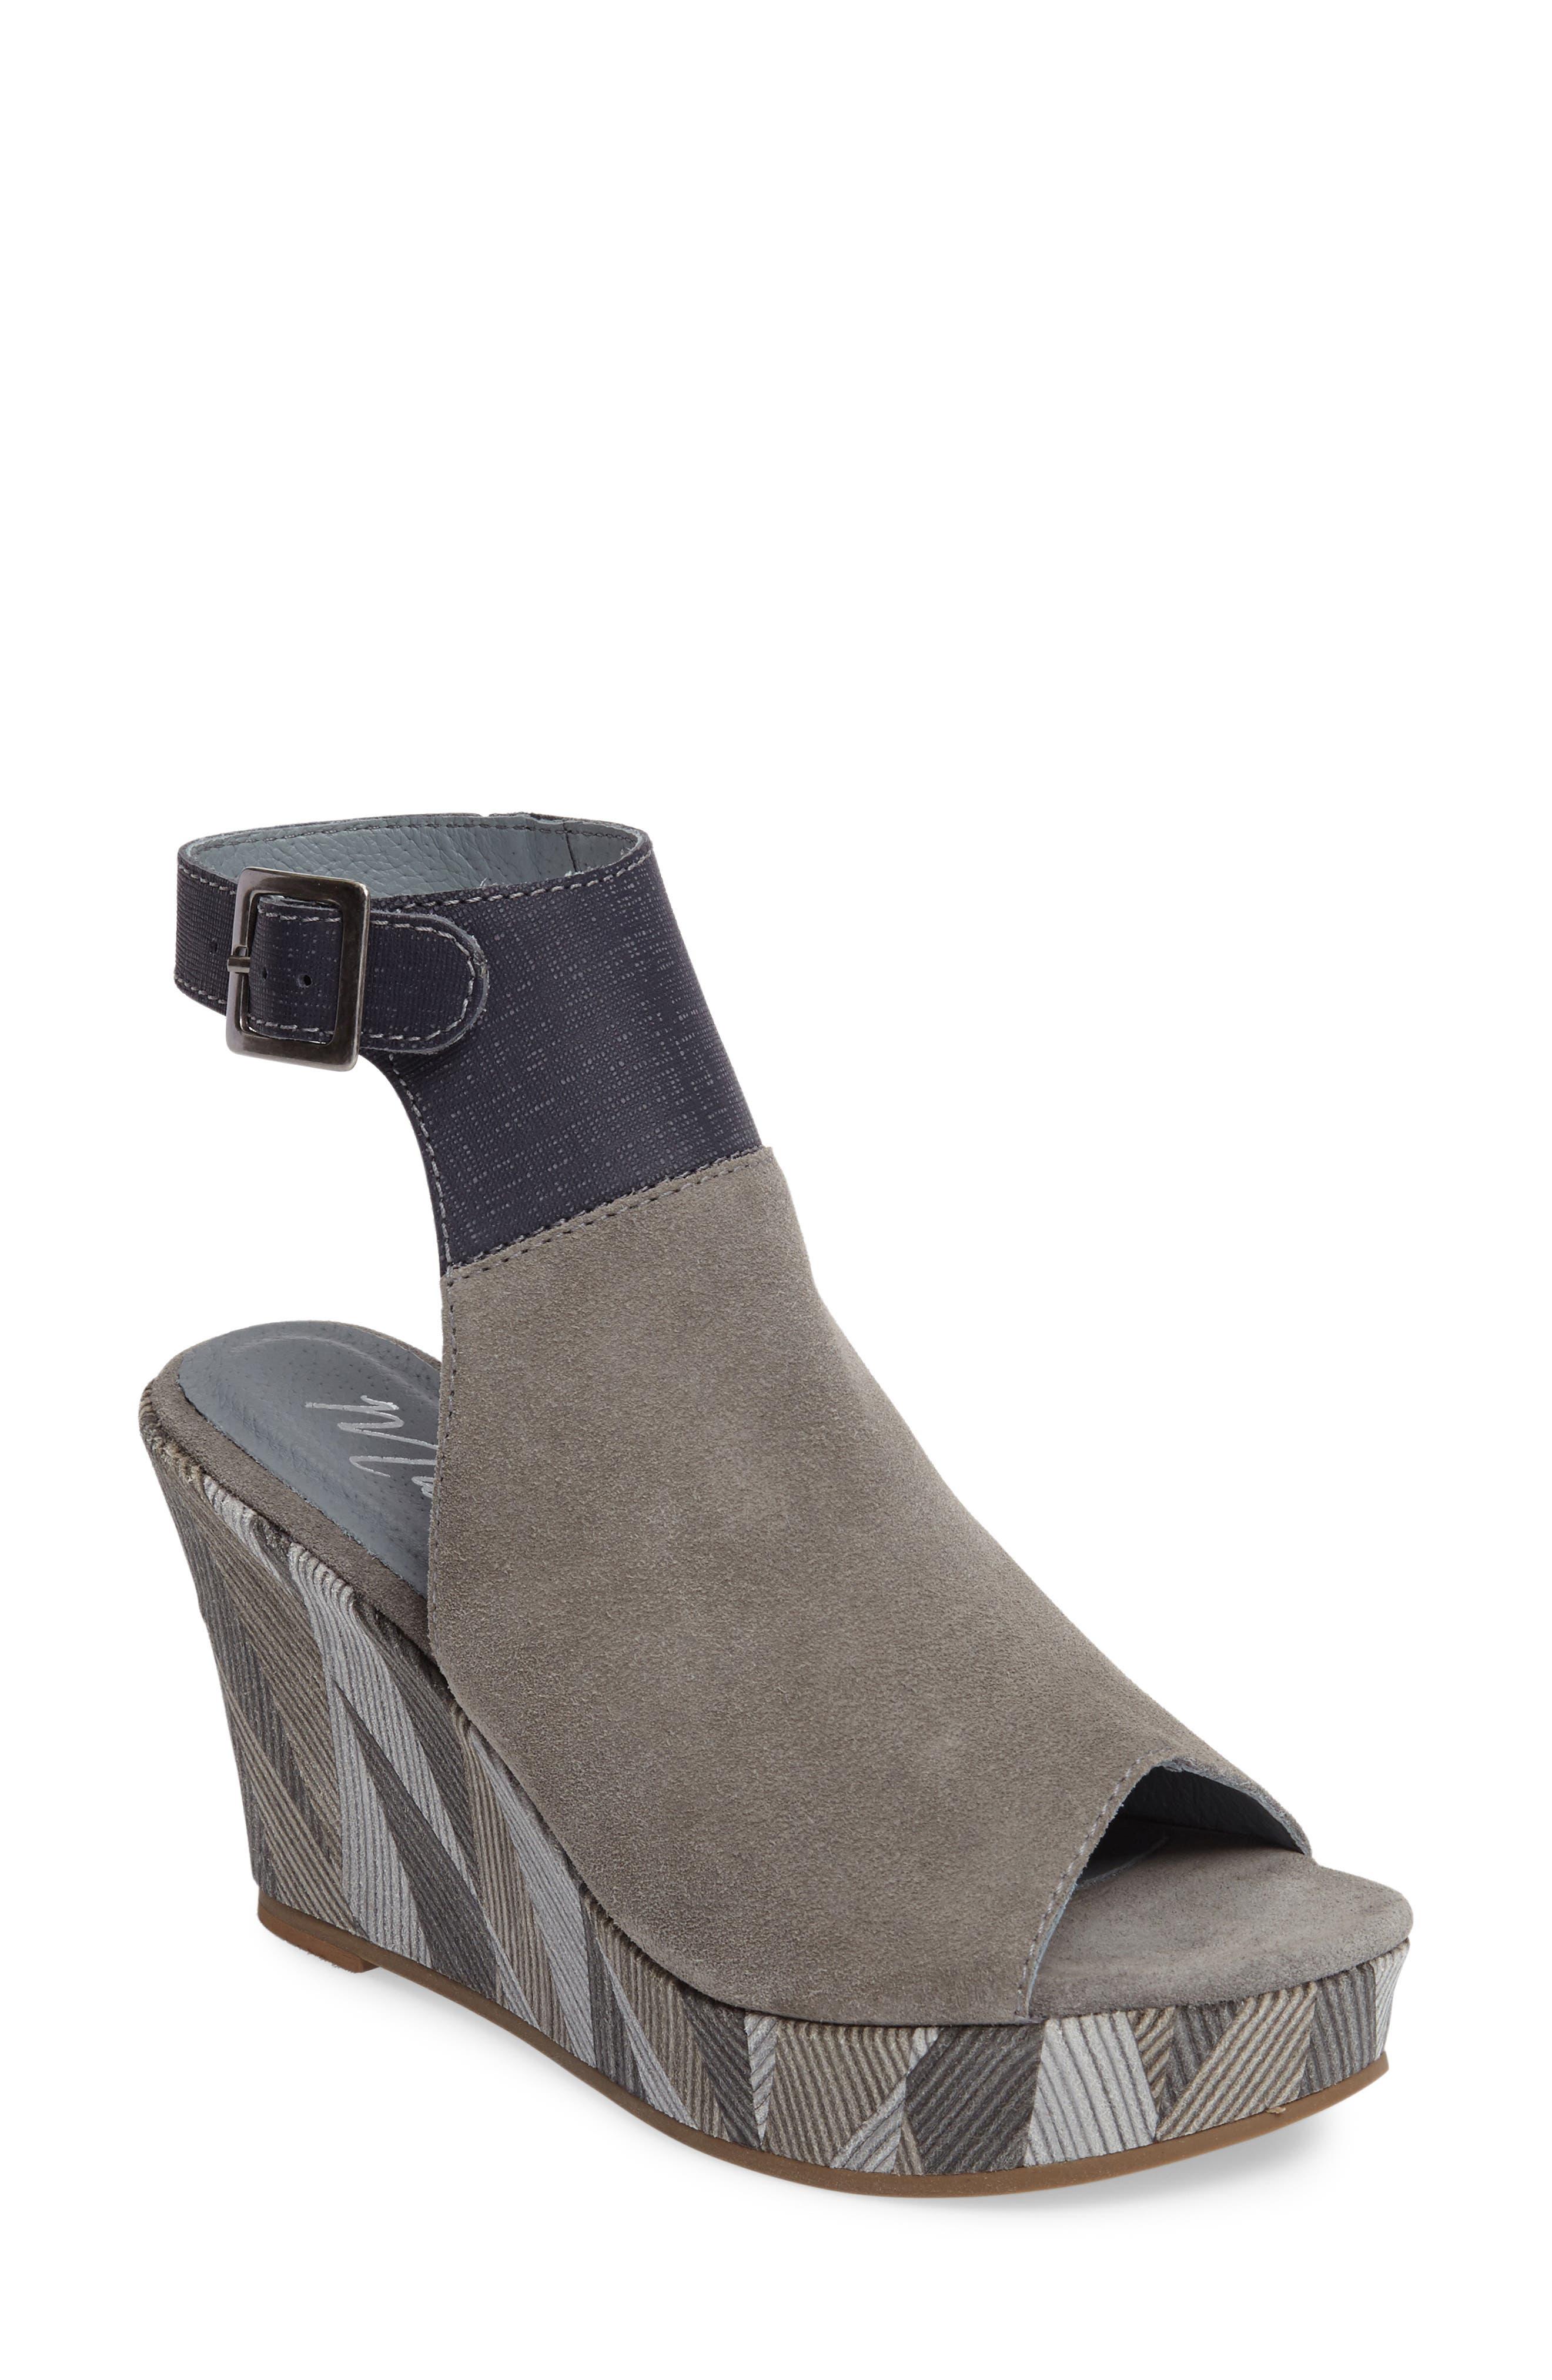 Harlequin Wedge Sandal,                         Main,                         color, 029